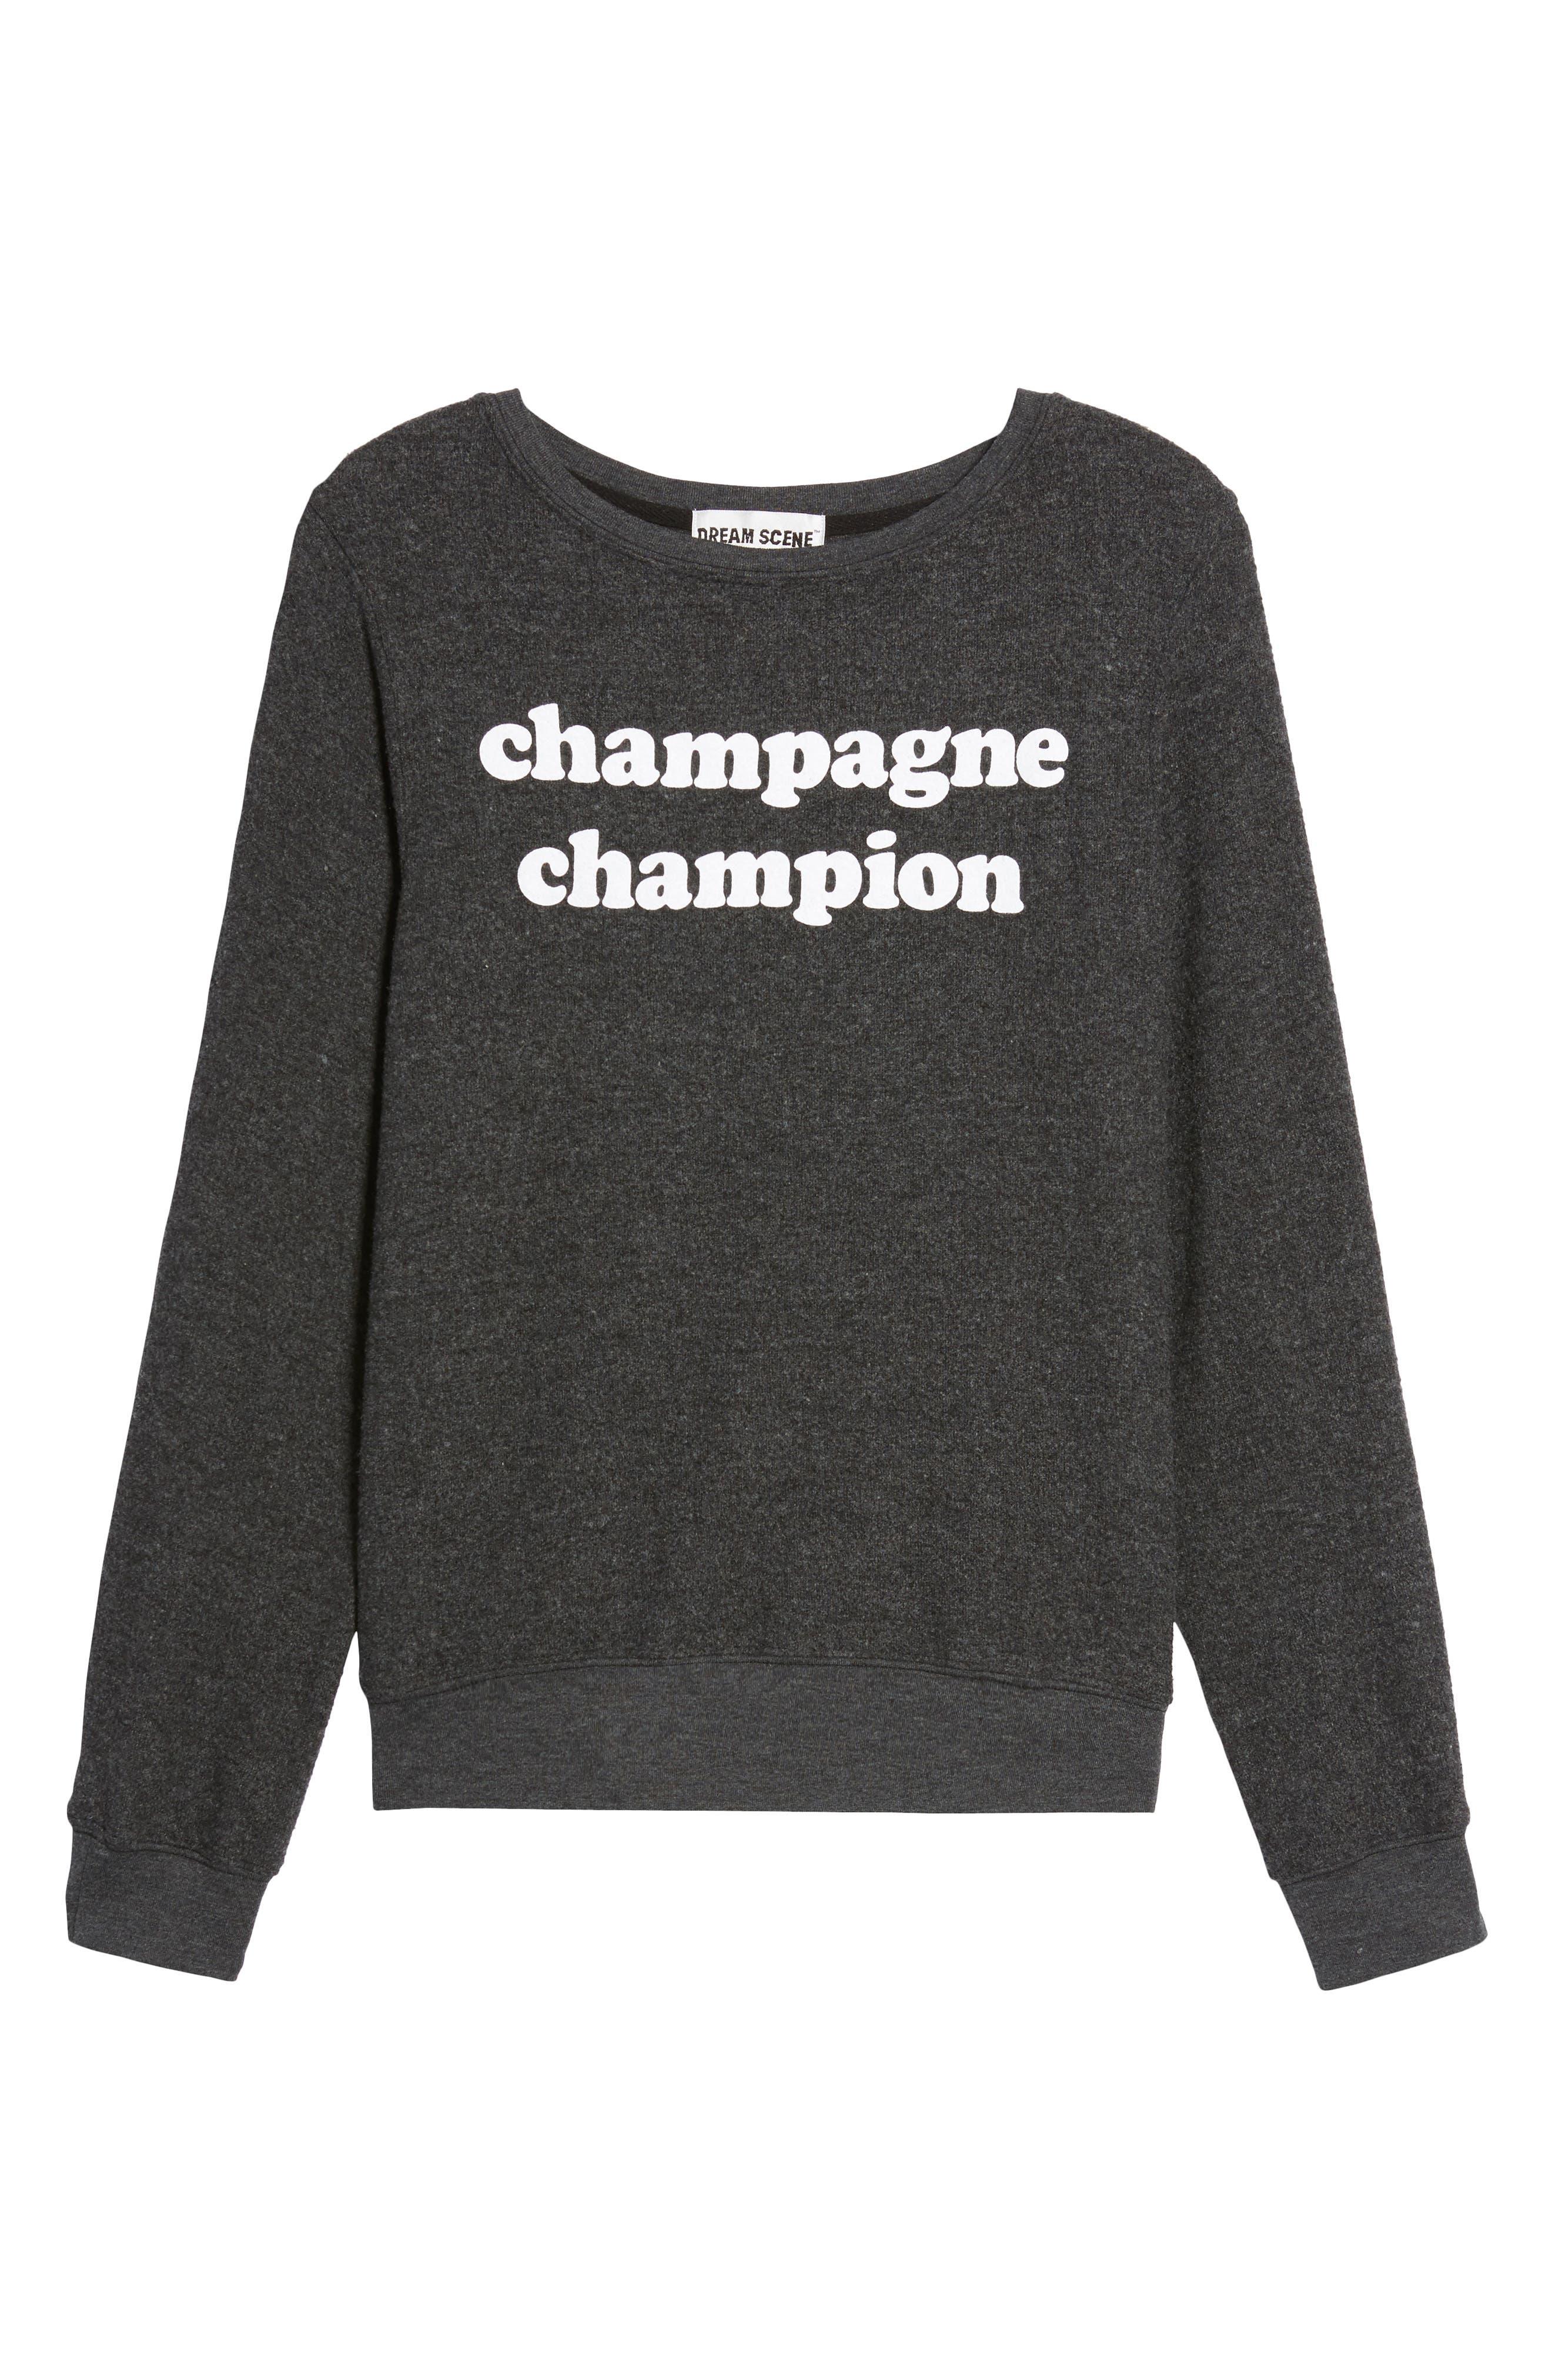 Champagne Champion Sweatshirt,                             Alternate thumbnail 6, color,                             001